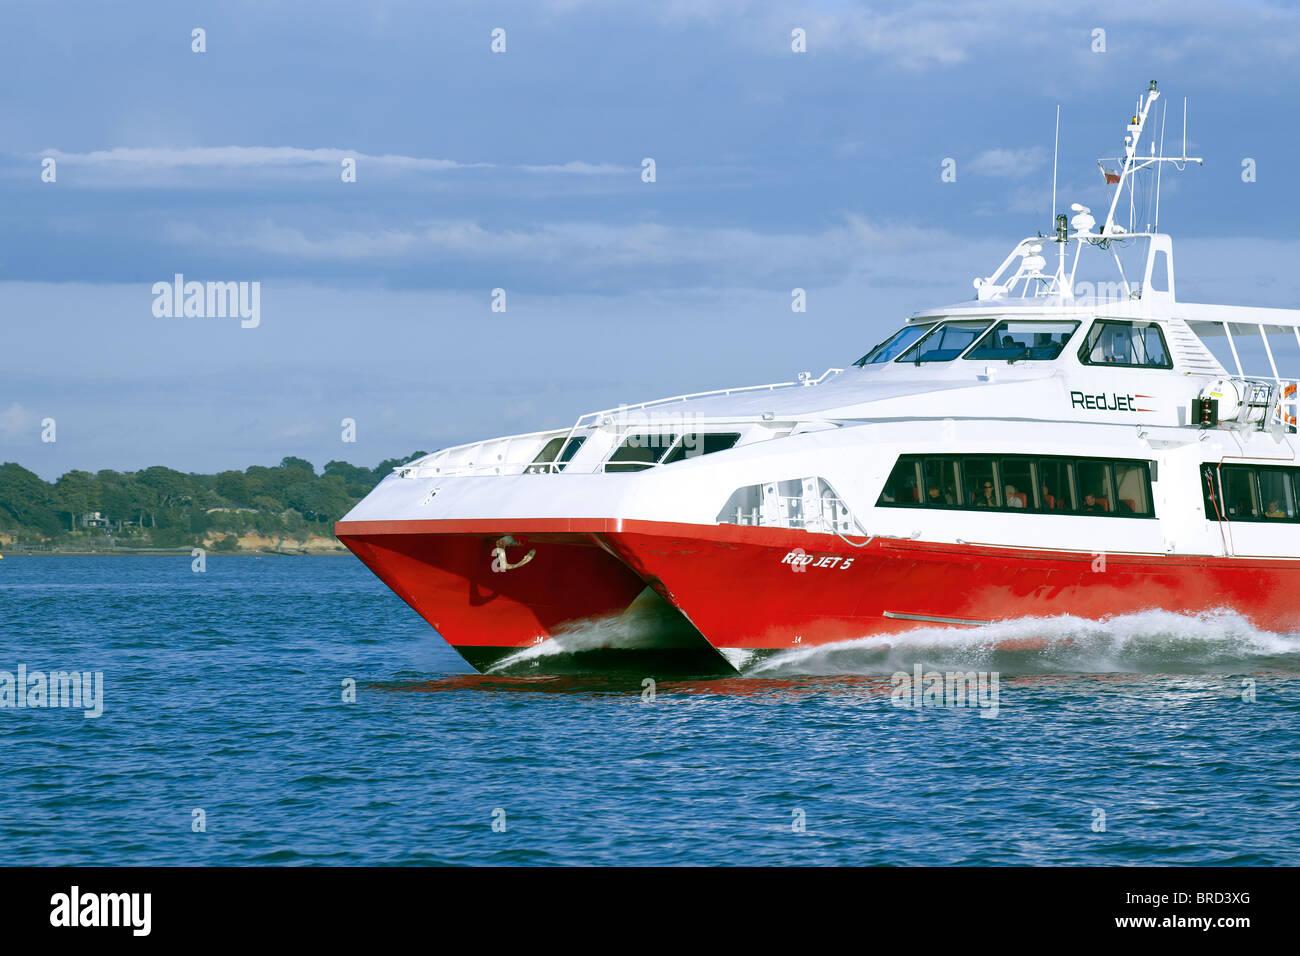 schnelle Katamaran rot Jet Cowes nach Southampton Stockbild